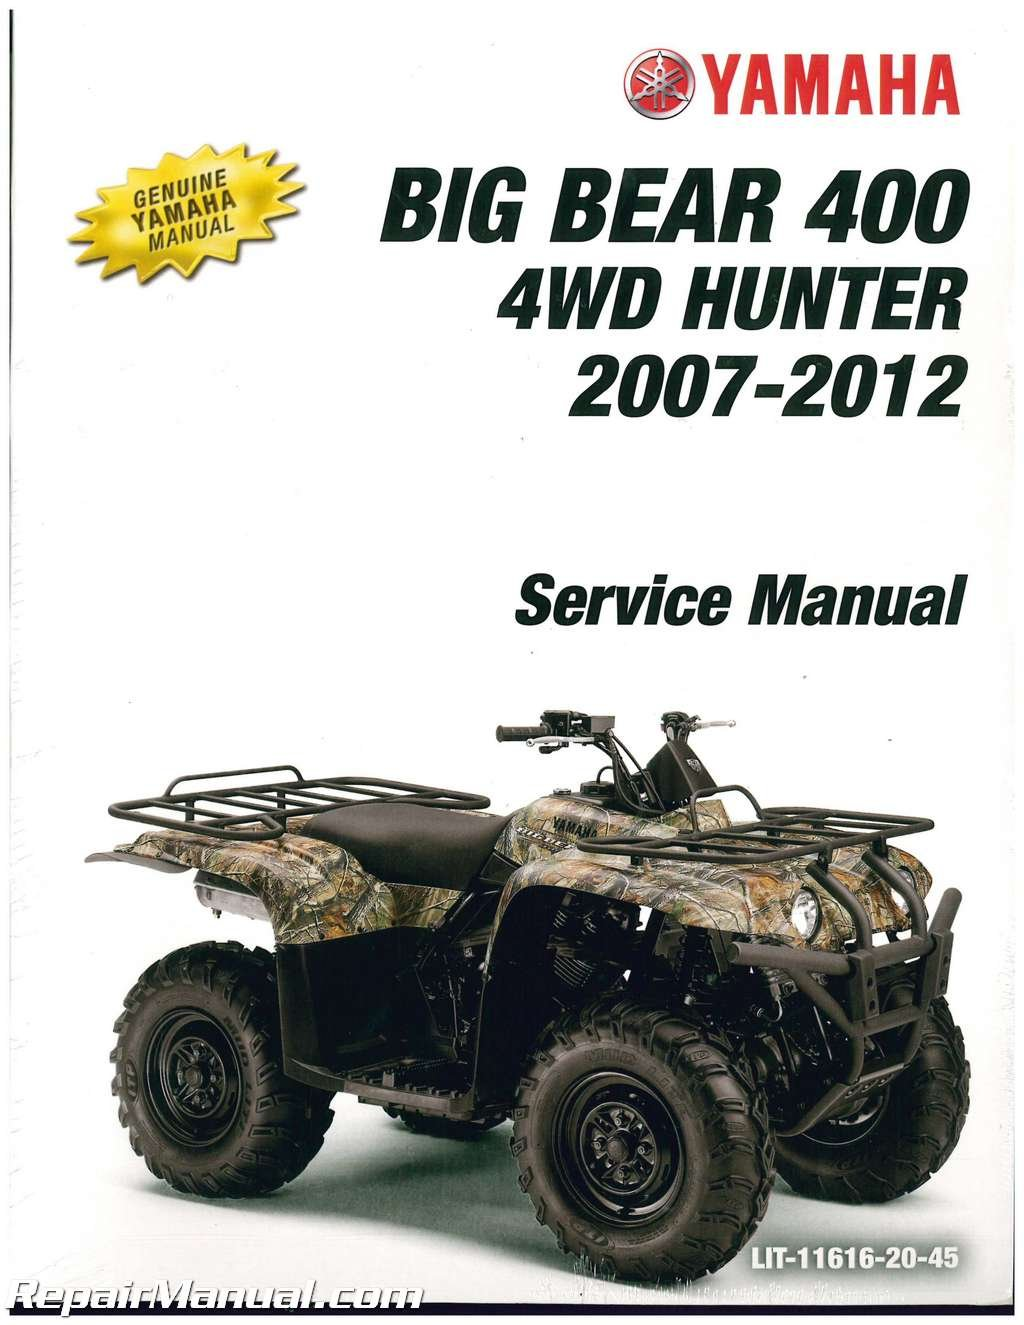 Read Online LIT-11616-20-45 2007-2012 Yamaha YFM400 Big Bear 400 4X4 ATV Service Manual pdf epub